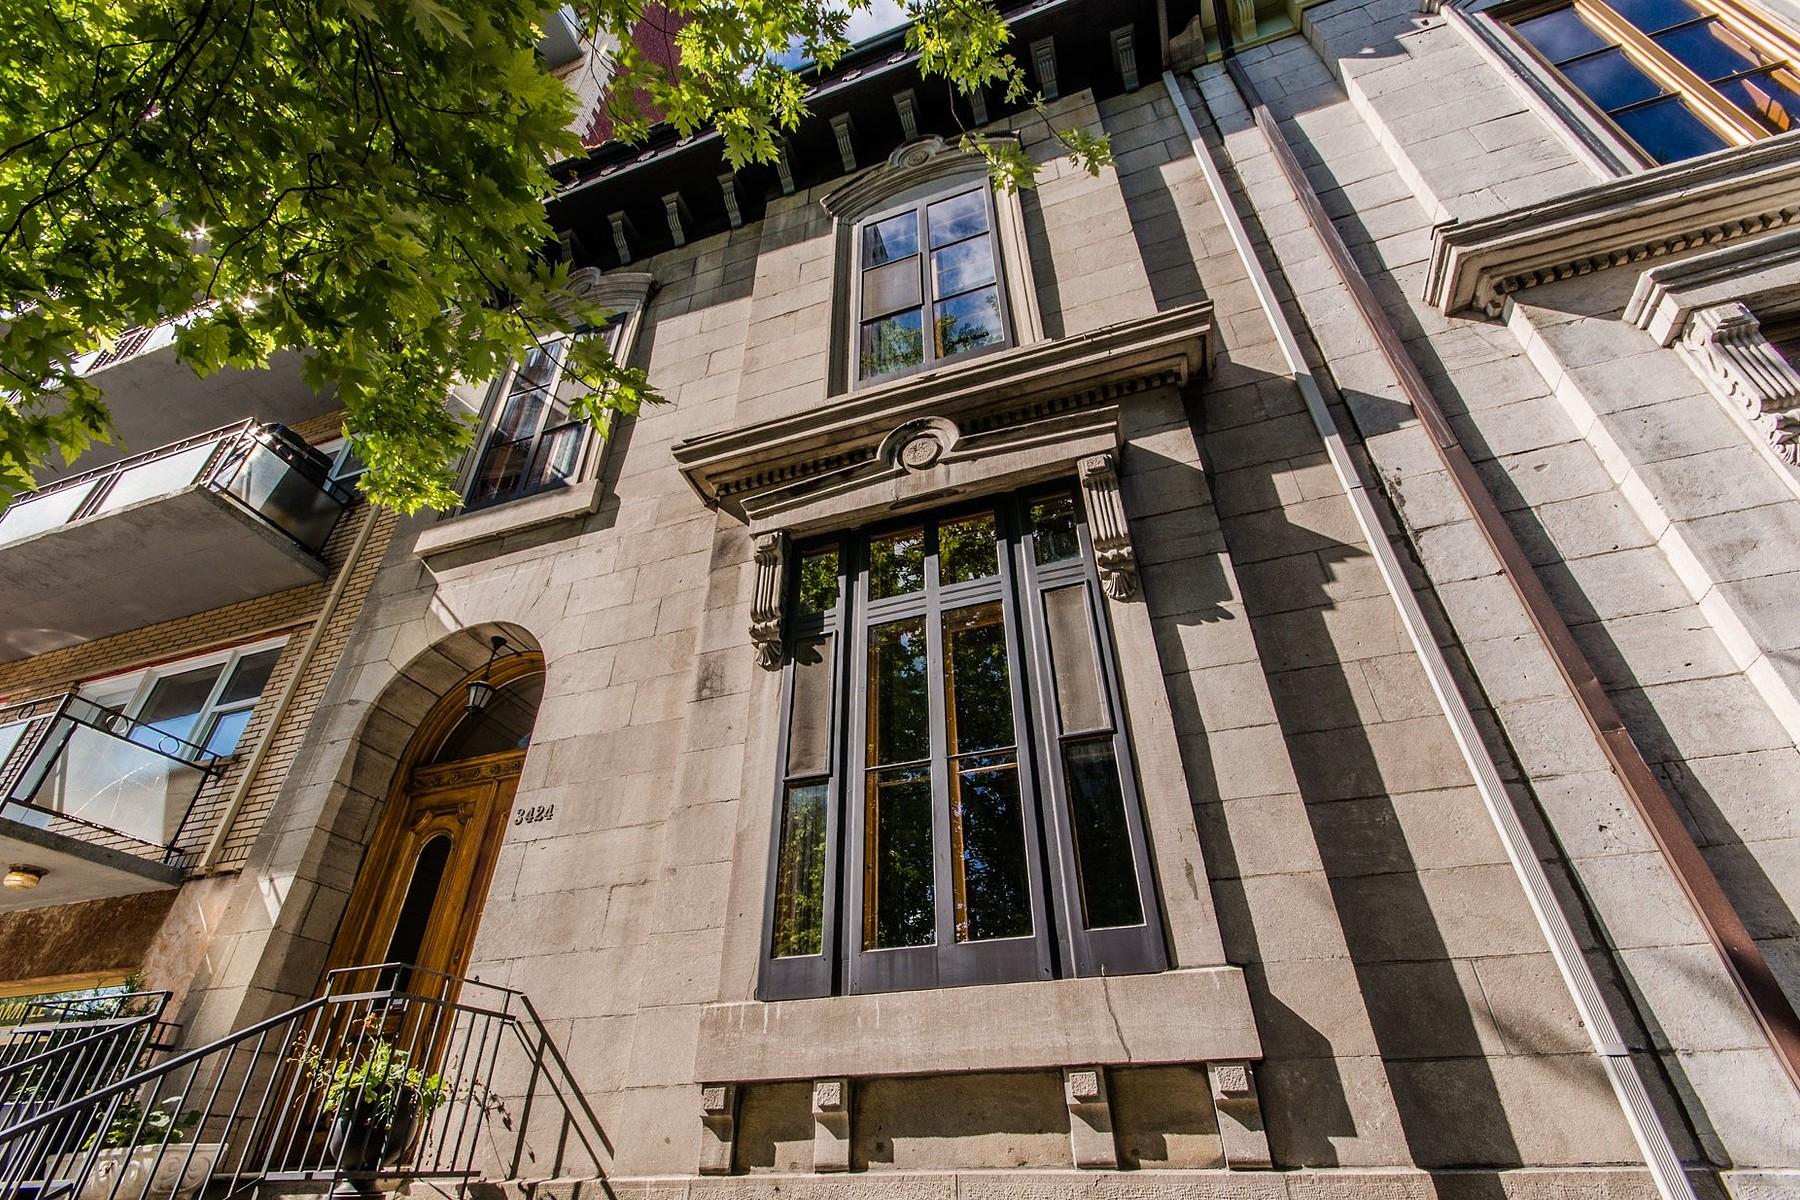 Частный односемейный дом для того Продажа на Le Plateau-Mont-Royal (Montréal), Montréal 3424 Rue Ste-Famille Montreal, Квебек H2X2K8 Канада